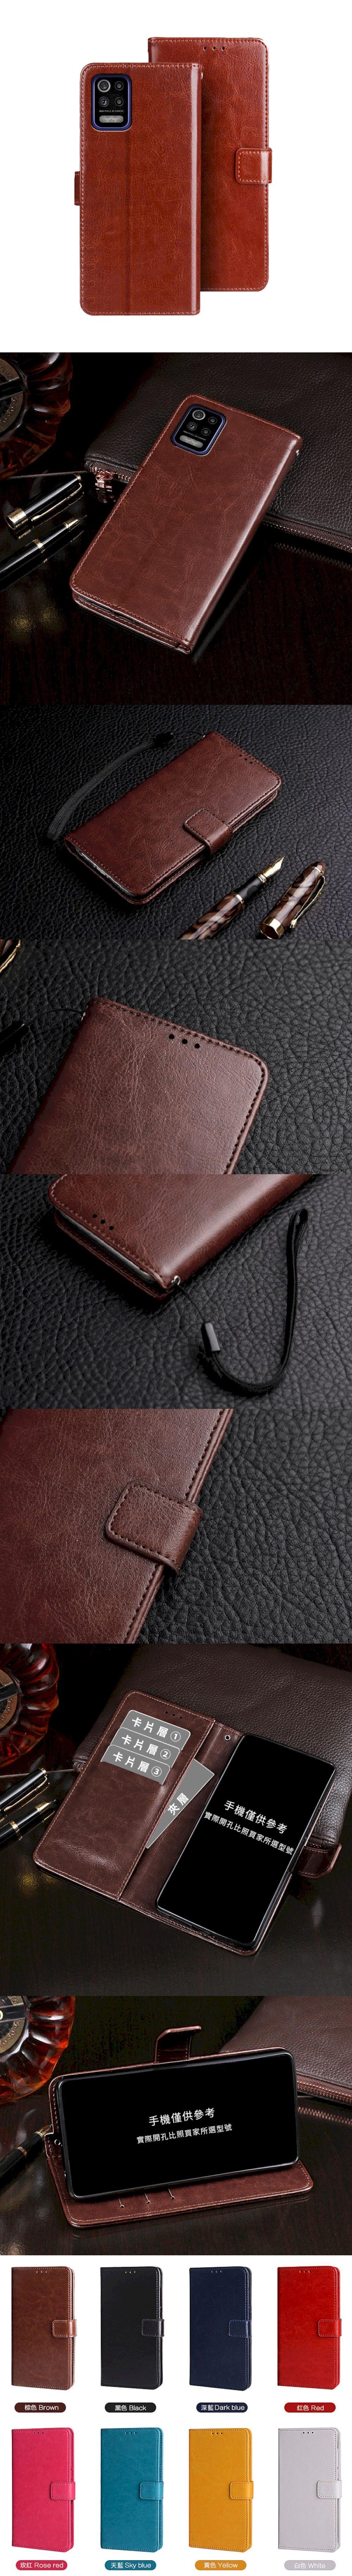 299-lg-扣帶左右翻蓋皮套(K52)